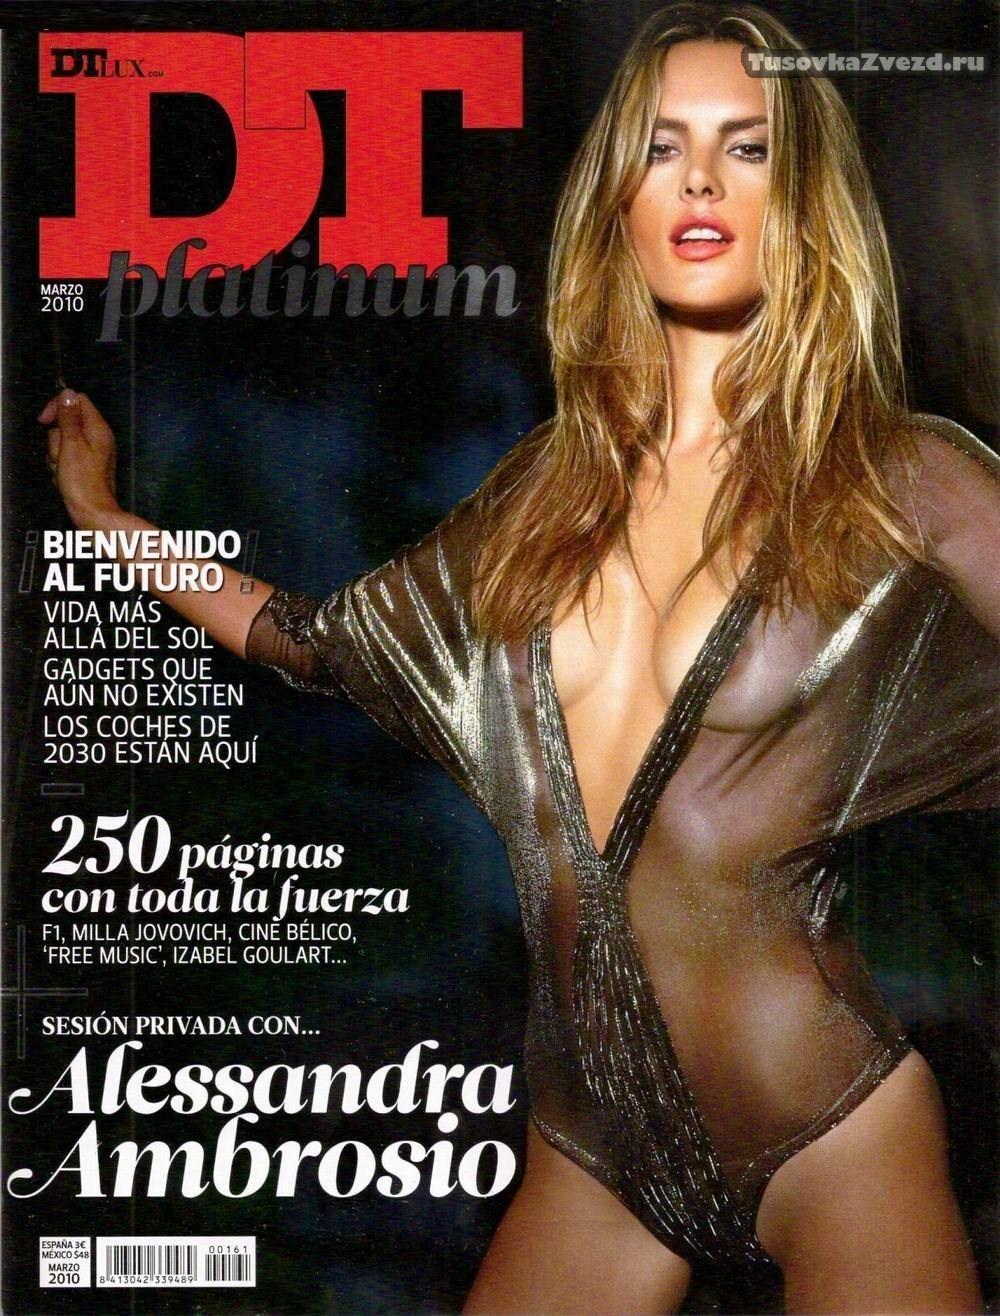 Алессандра Амбросио (Alessandra Ambrosio) голая, фото сессия для журнала DT Испания, март 2010